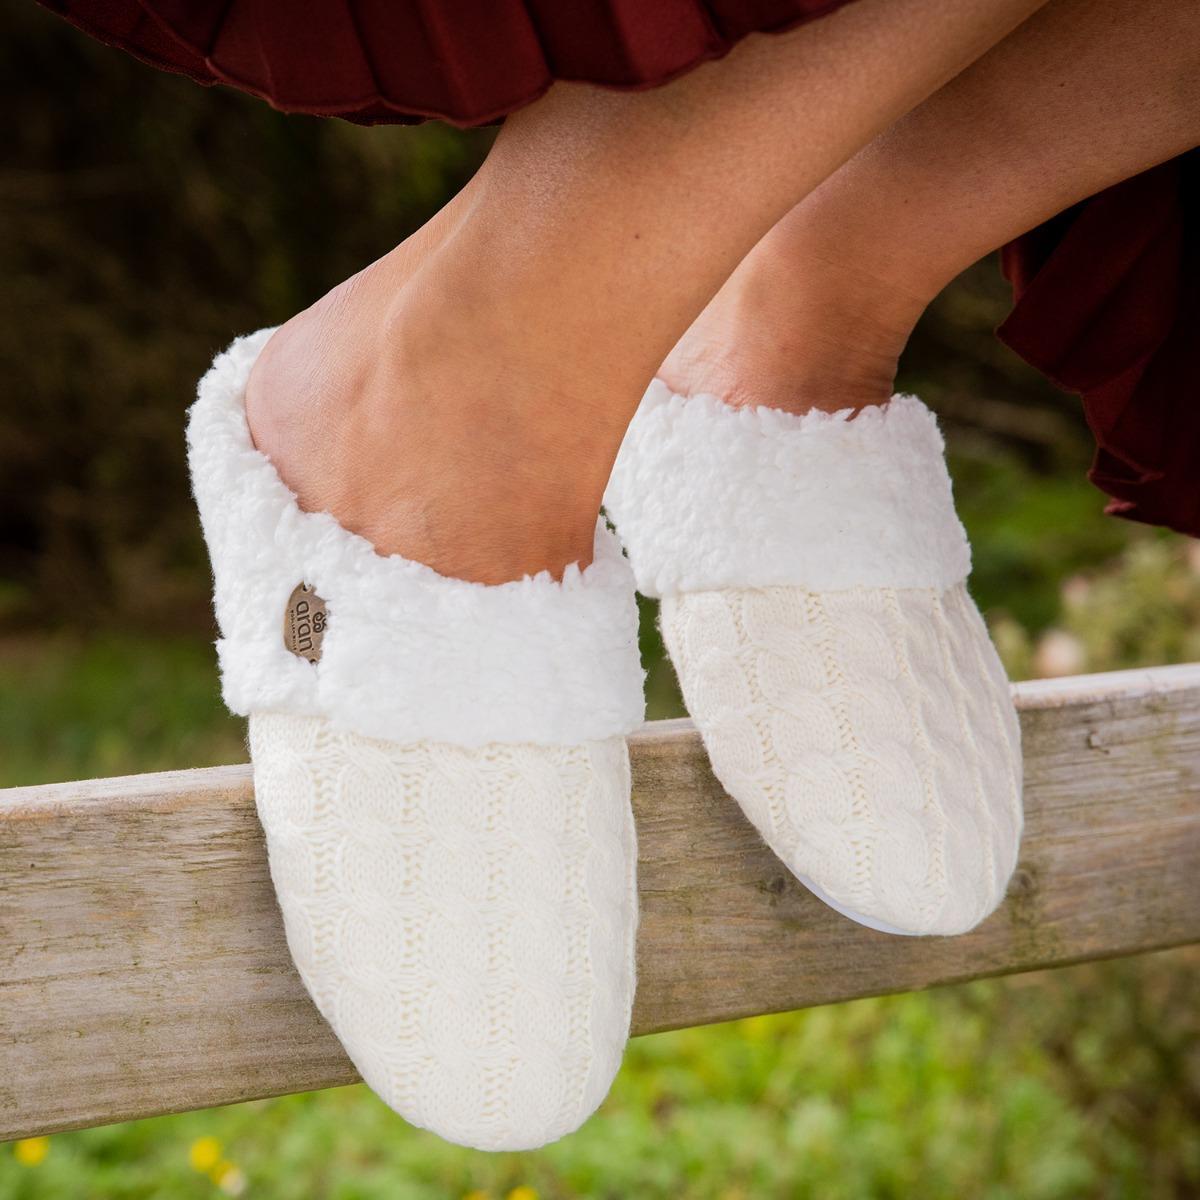 Cozy slipper Irish gifts for her